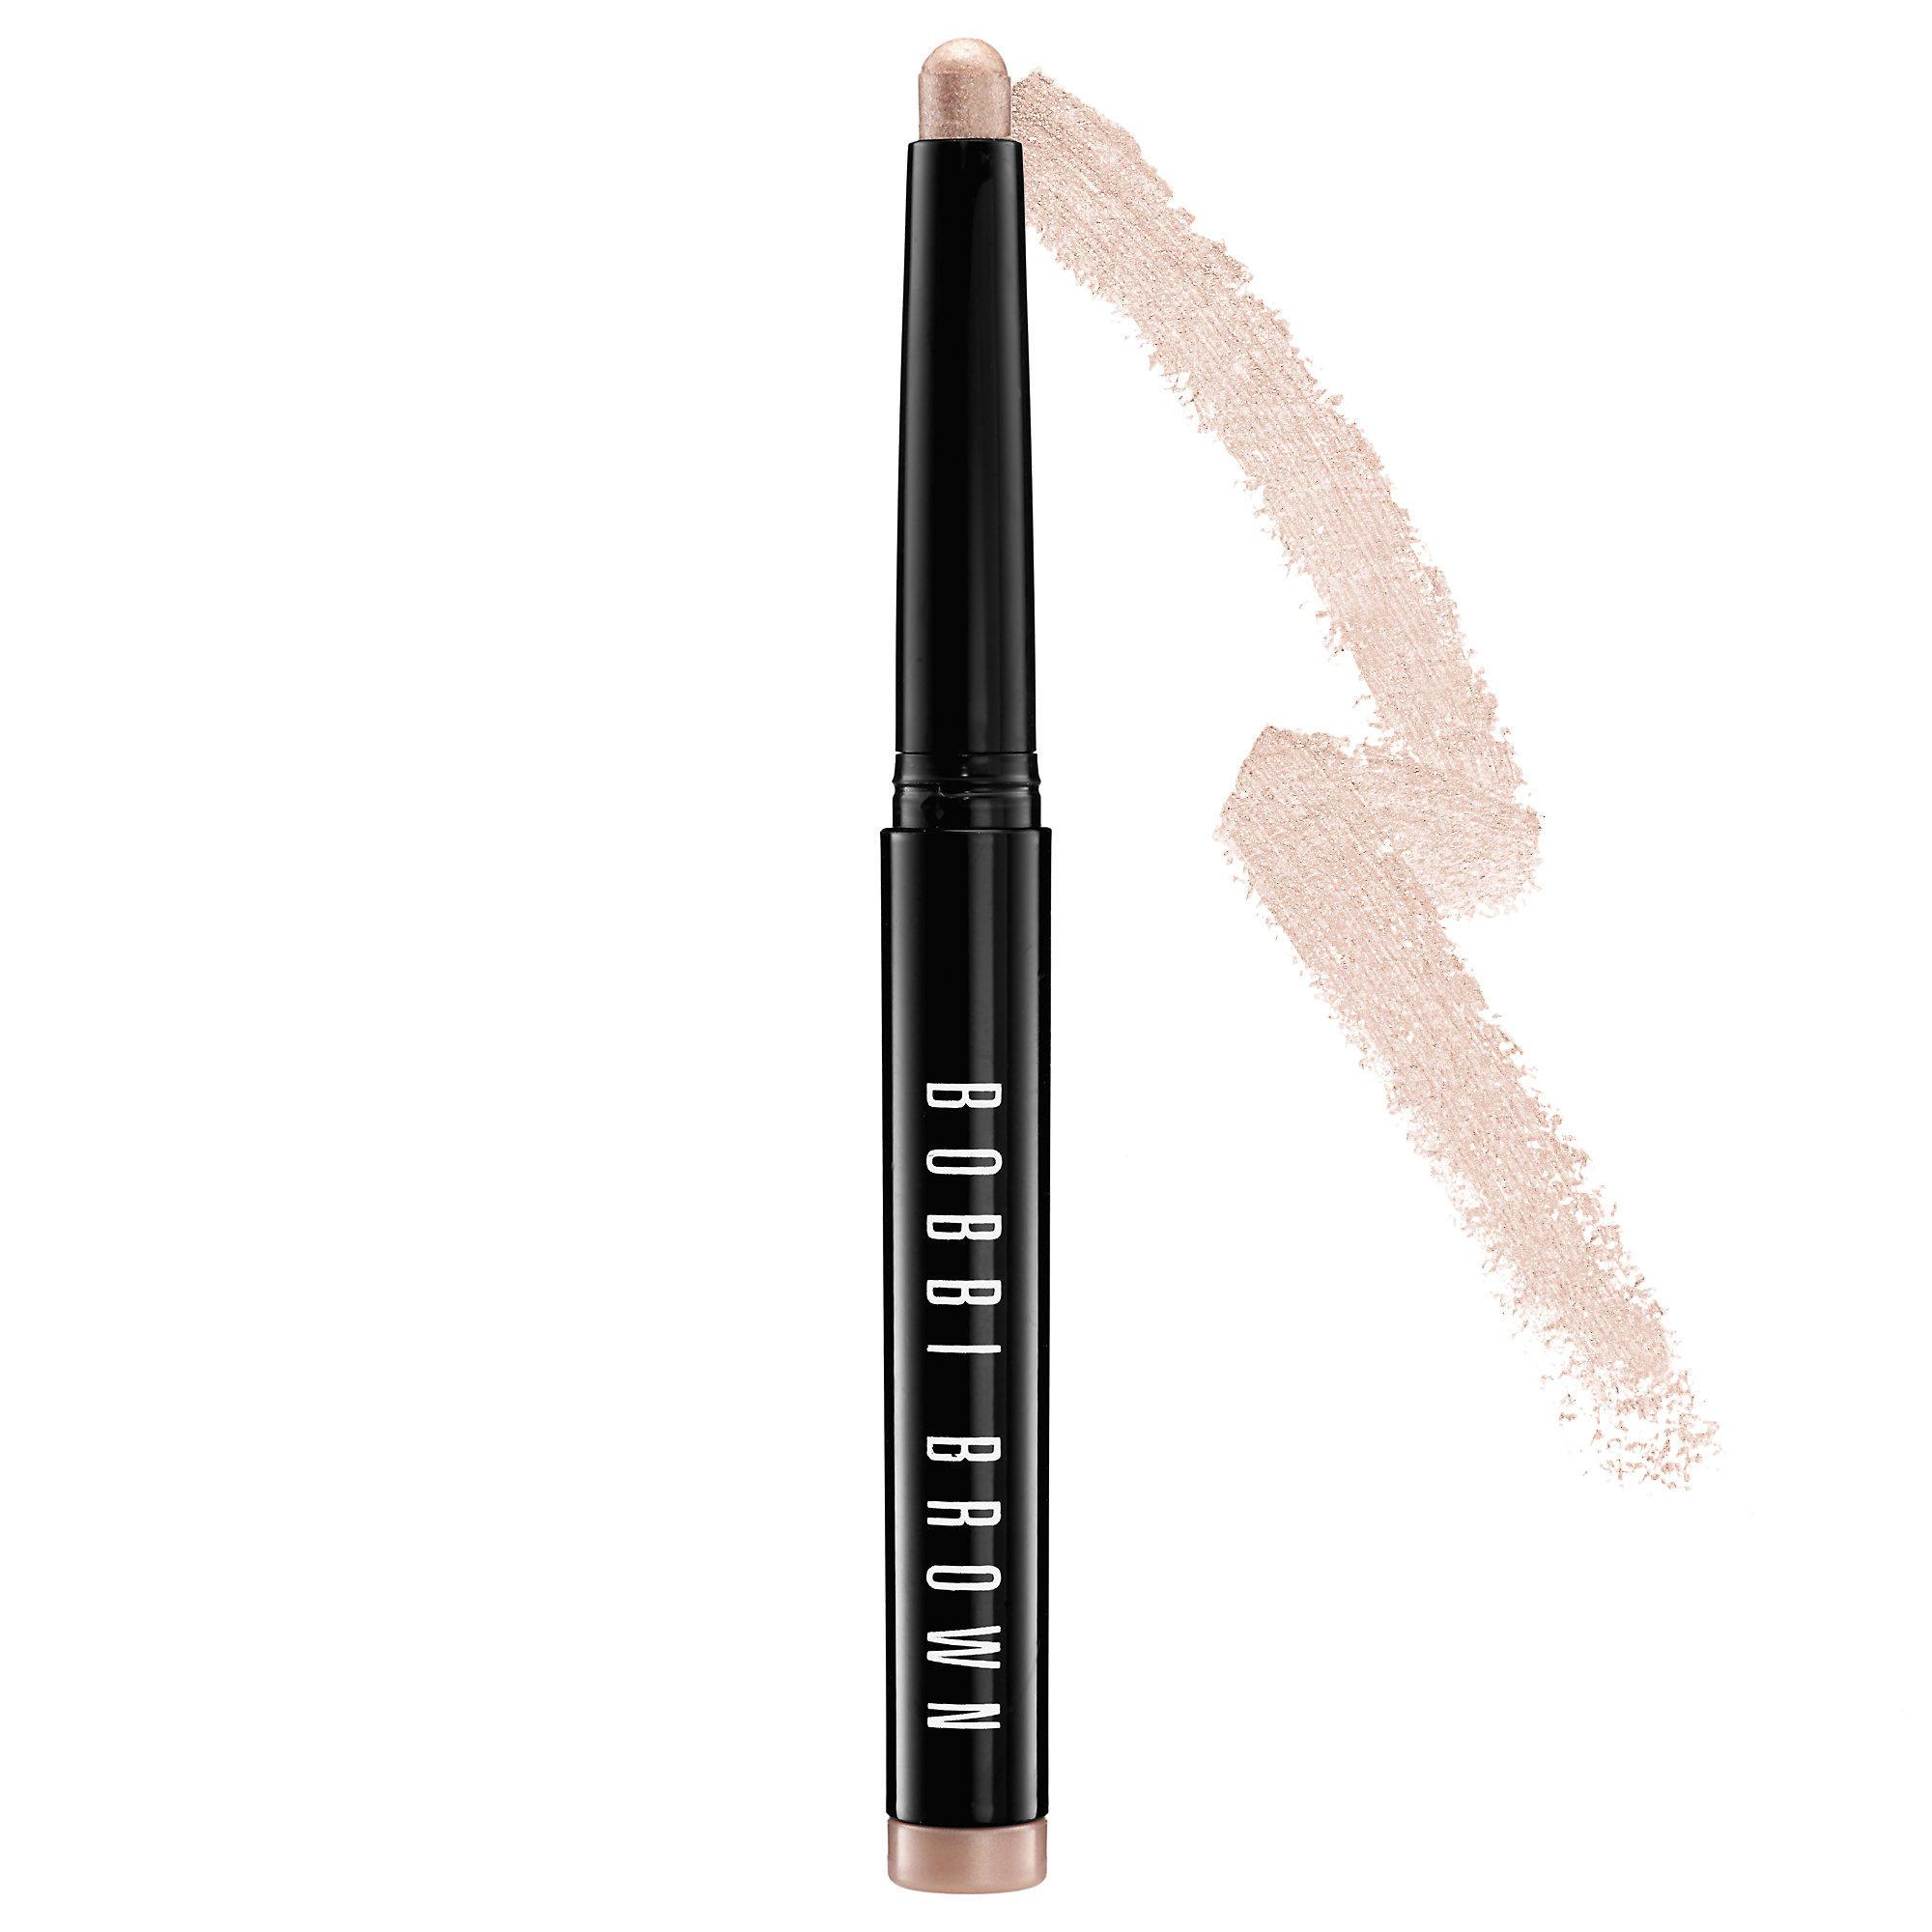 Bobbi Brown Longwear Cream Shadow Stick Golden Pink